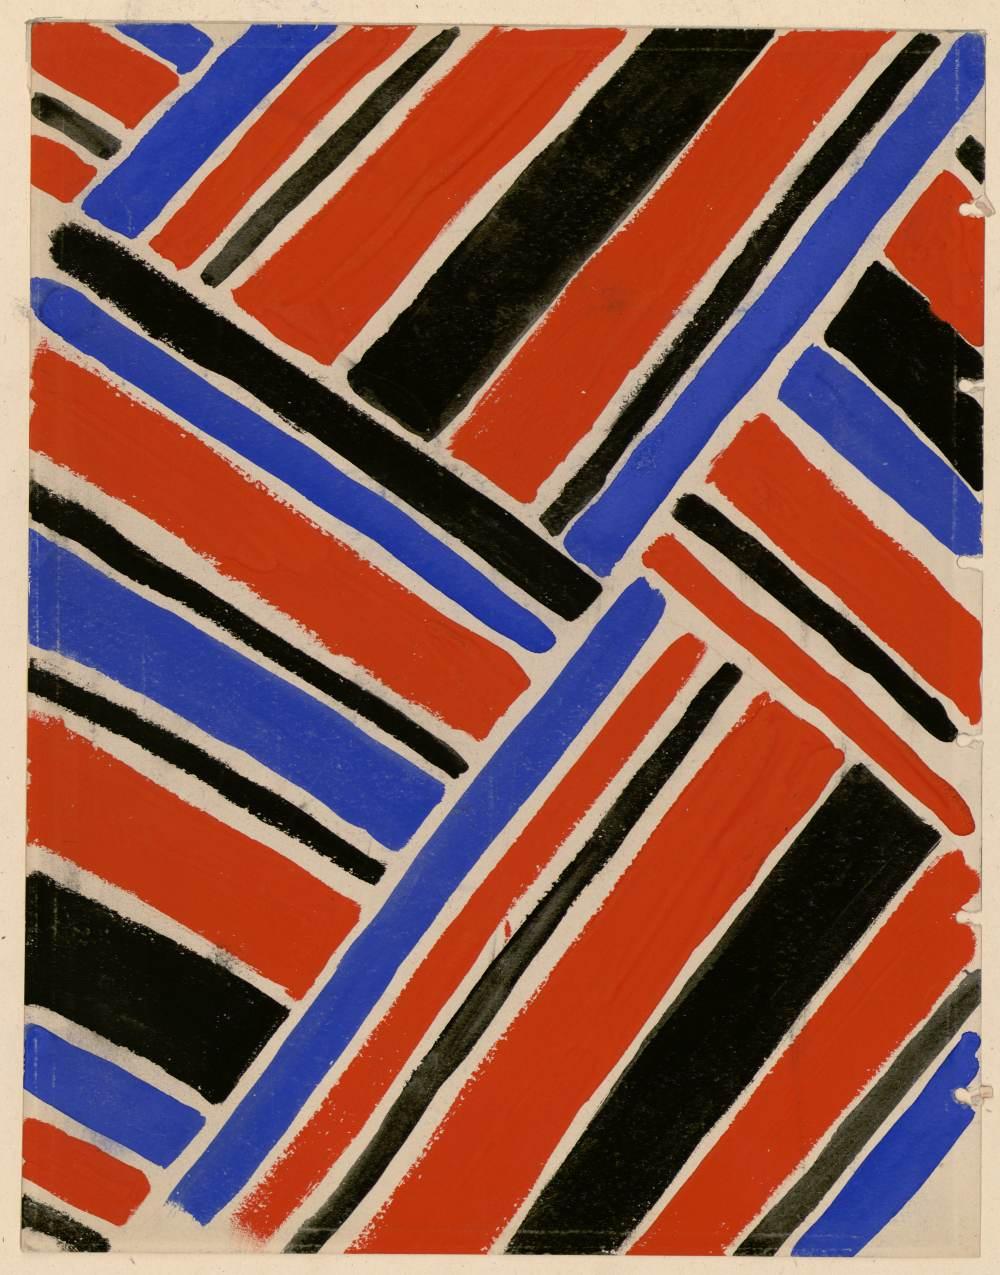 accrochage tissus simultan s de sonia delaunay dessins en couleurs 1924 1949 carnet de. Black Bedroom Furniture Sets. Home Design Ideas